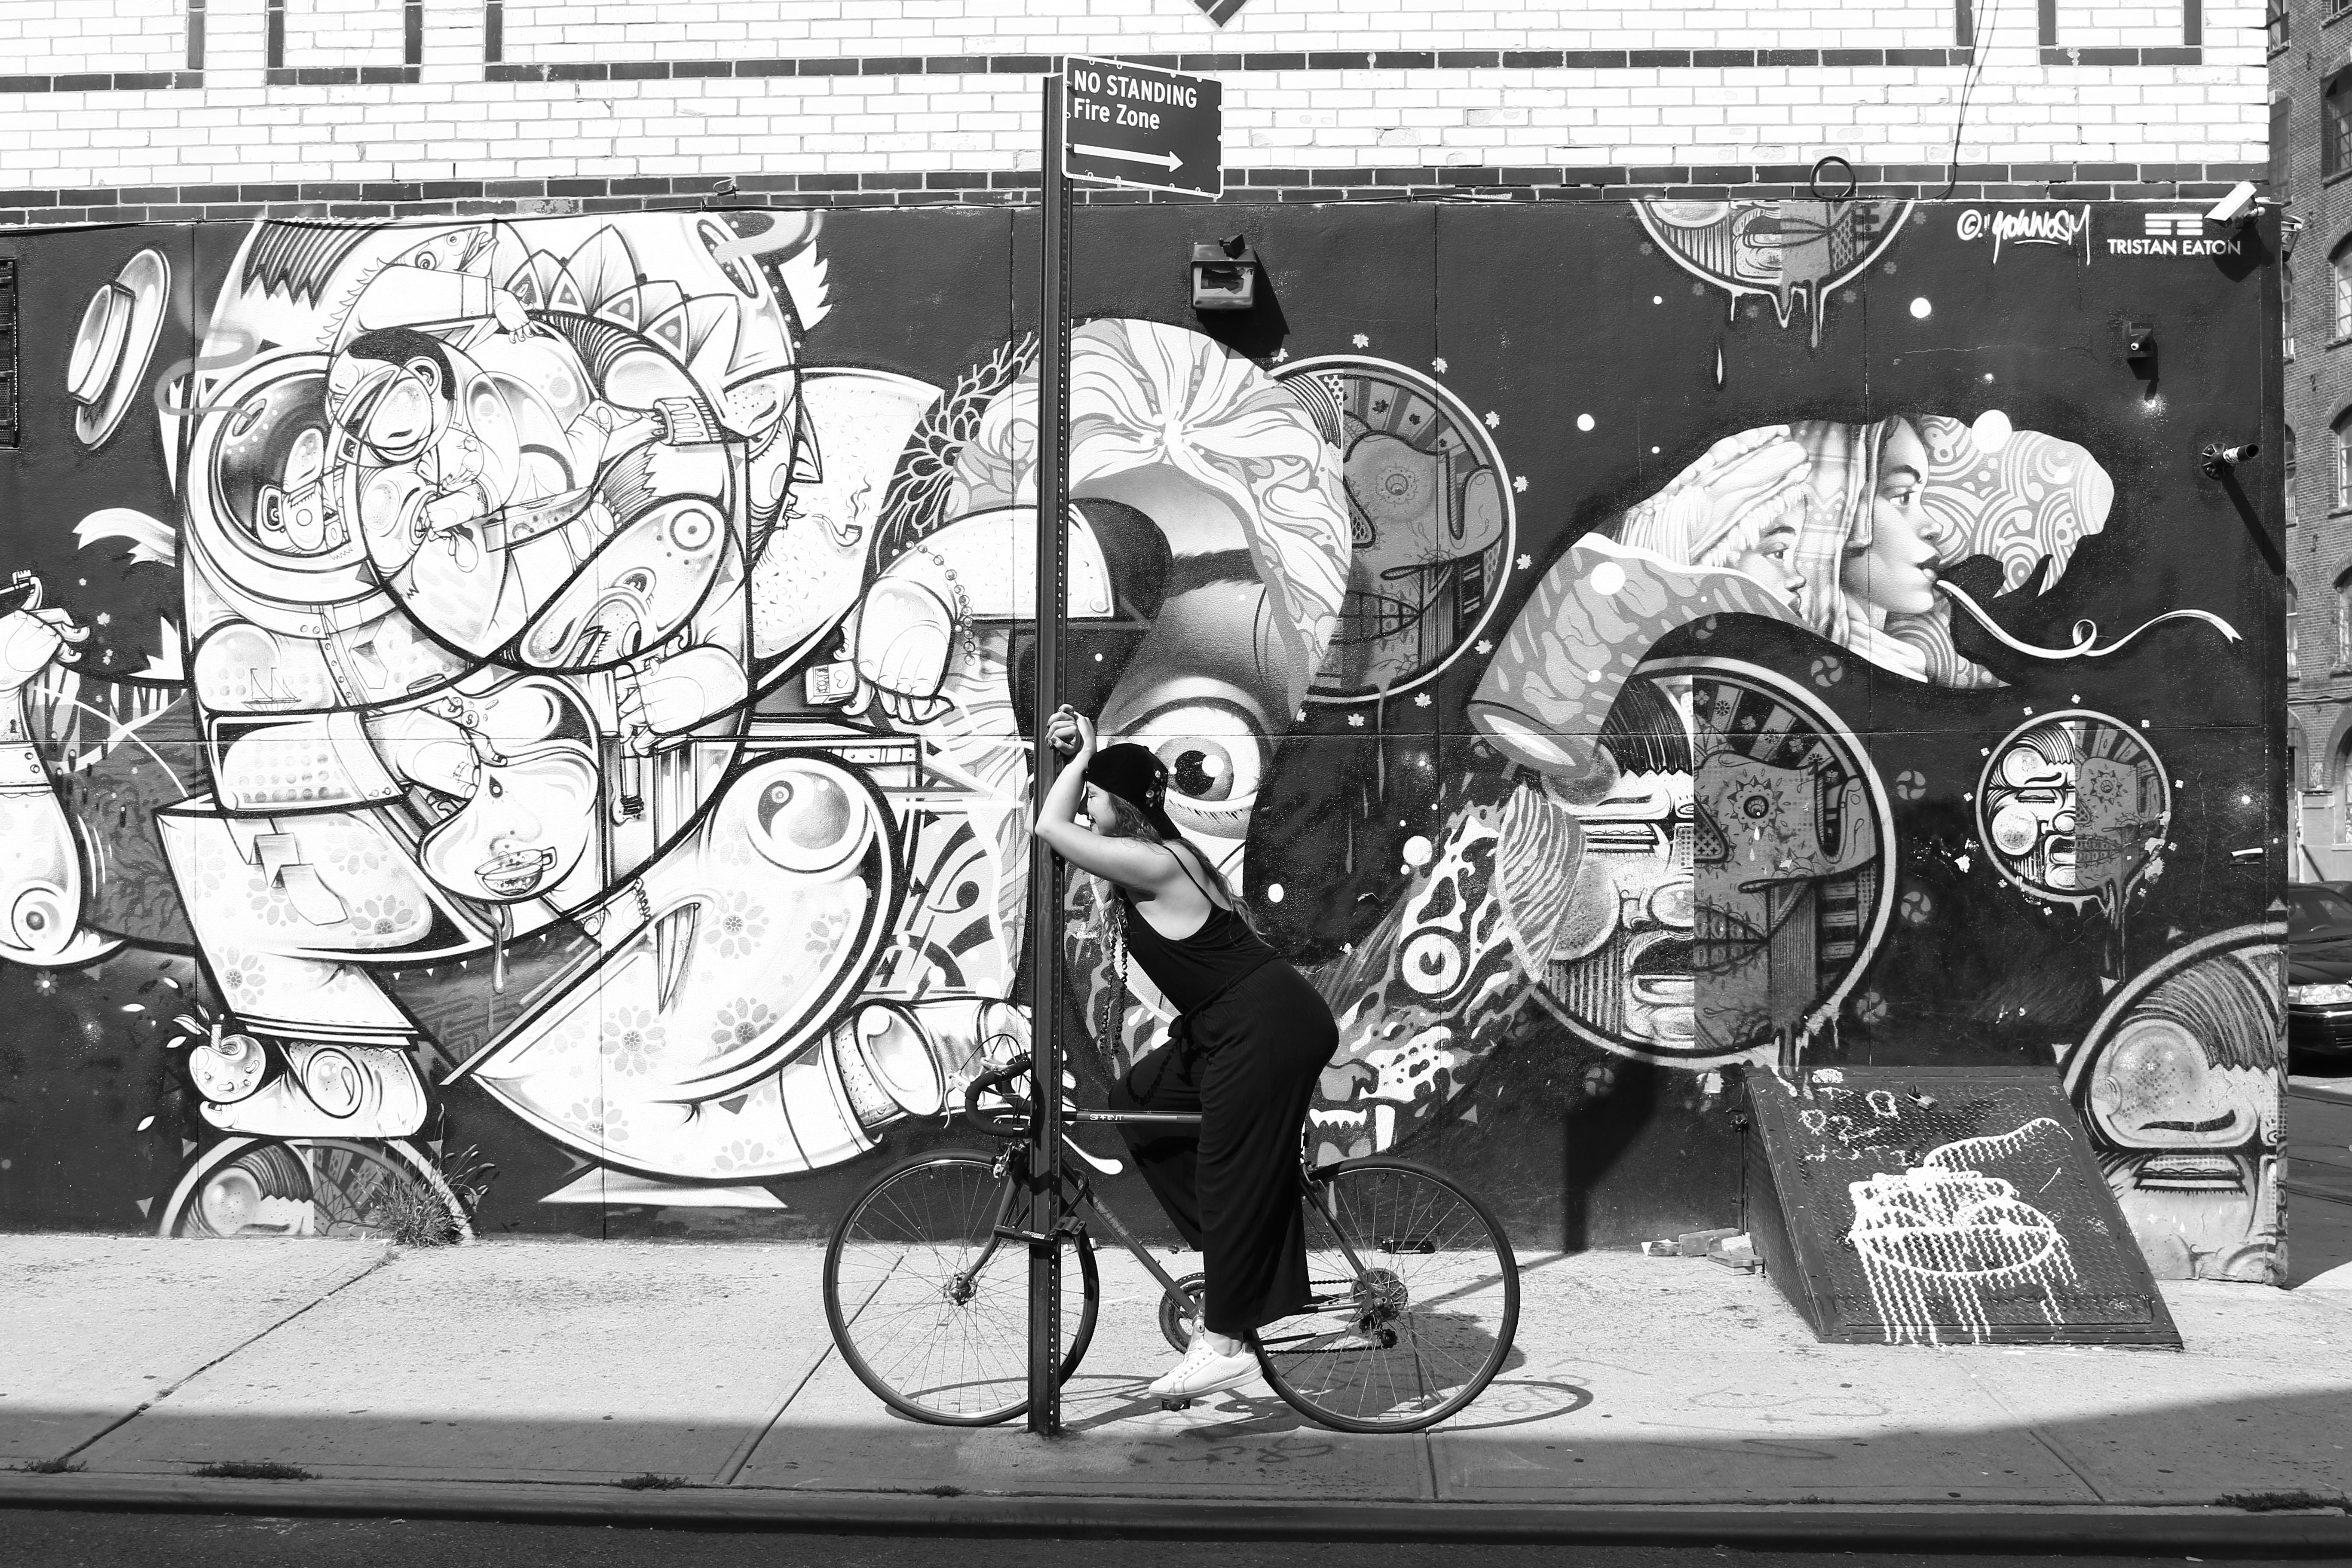 whatsartcollective-msballoon-studio-creativity-johanna-escobar-bicycle